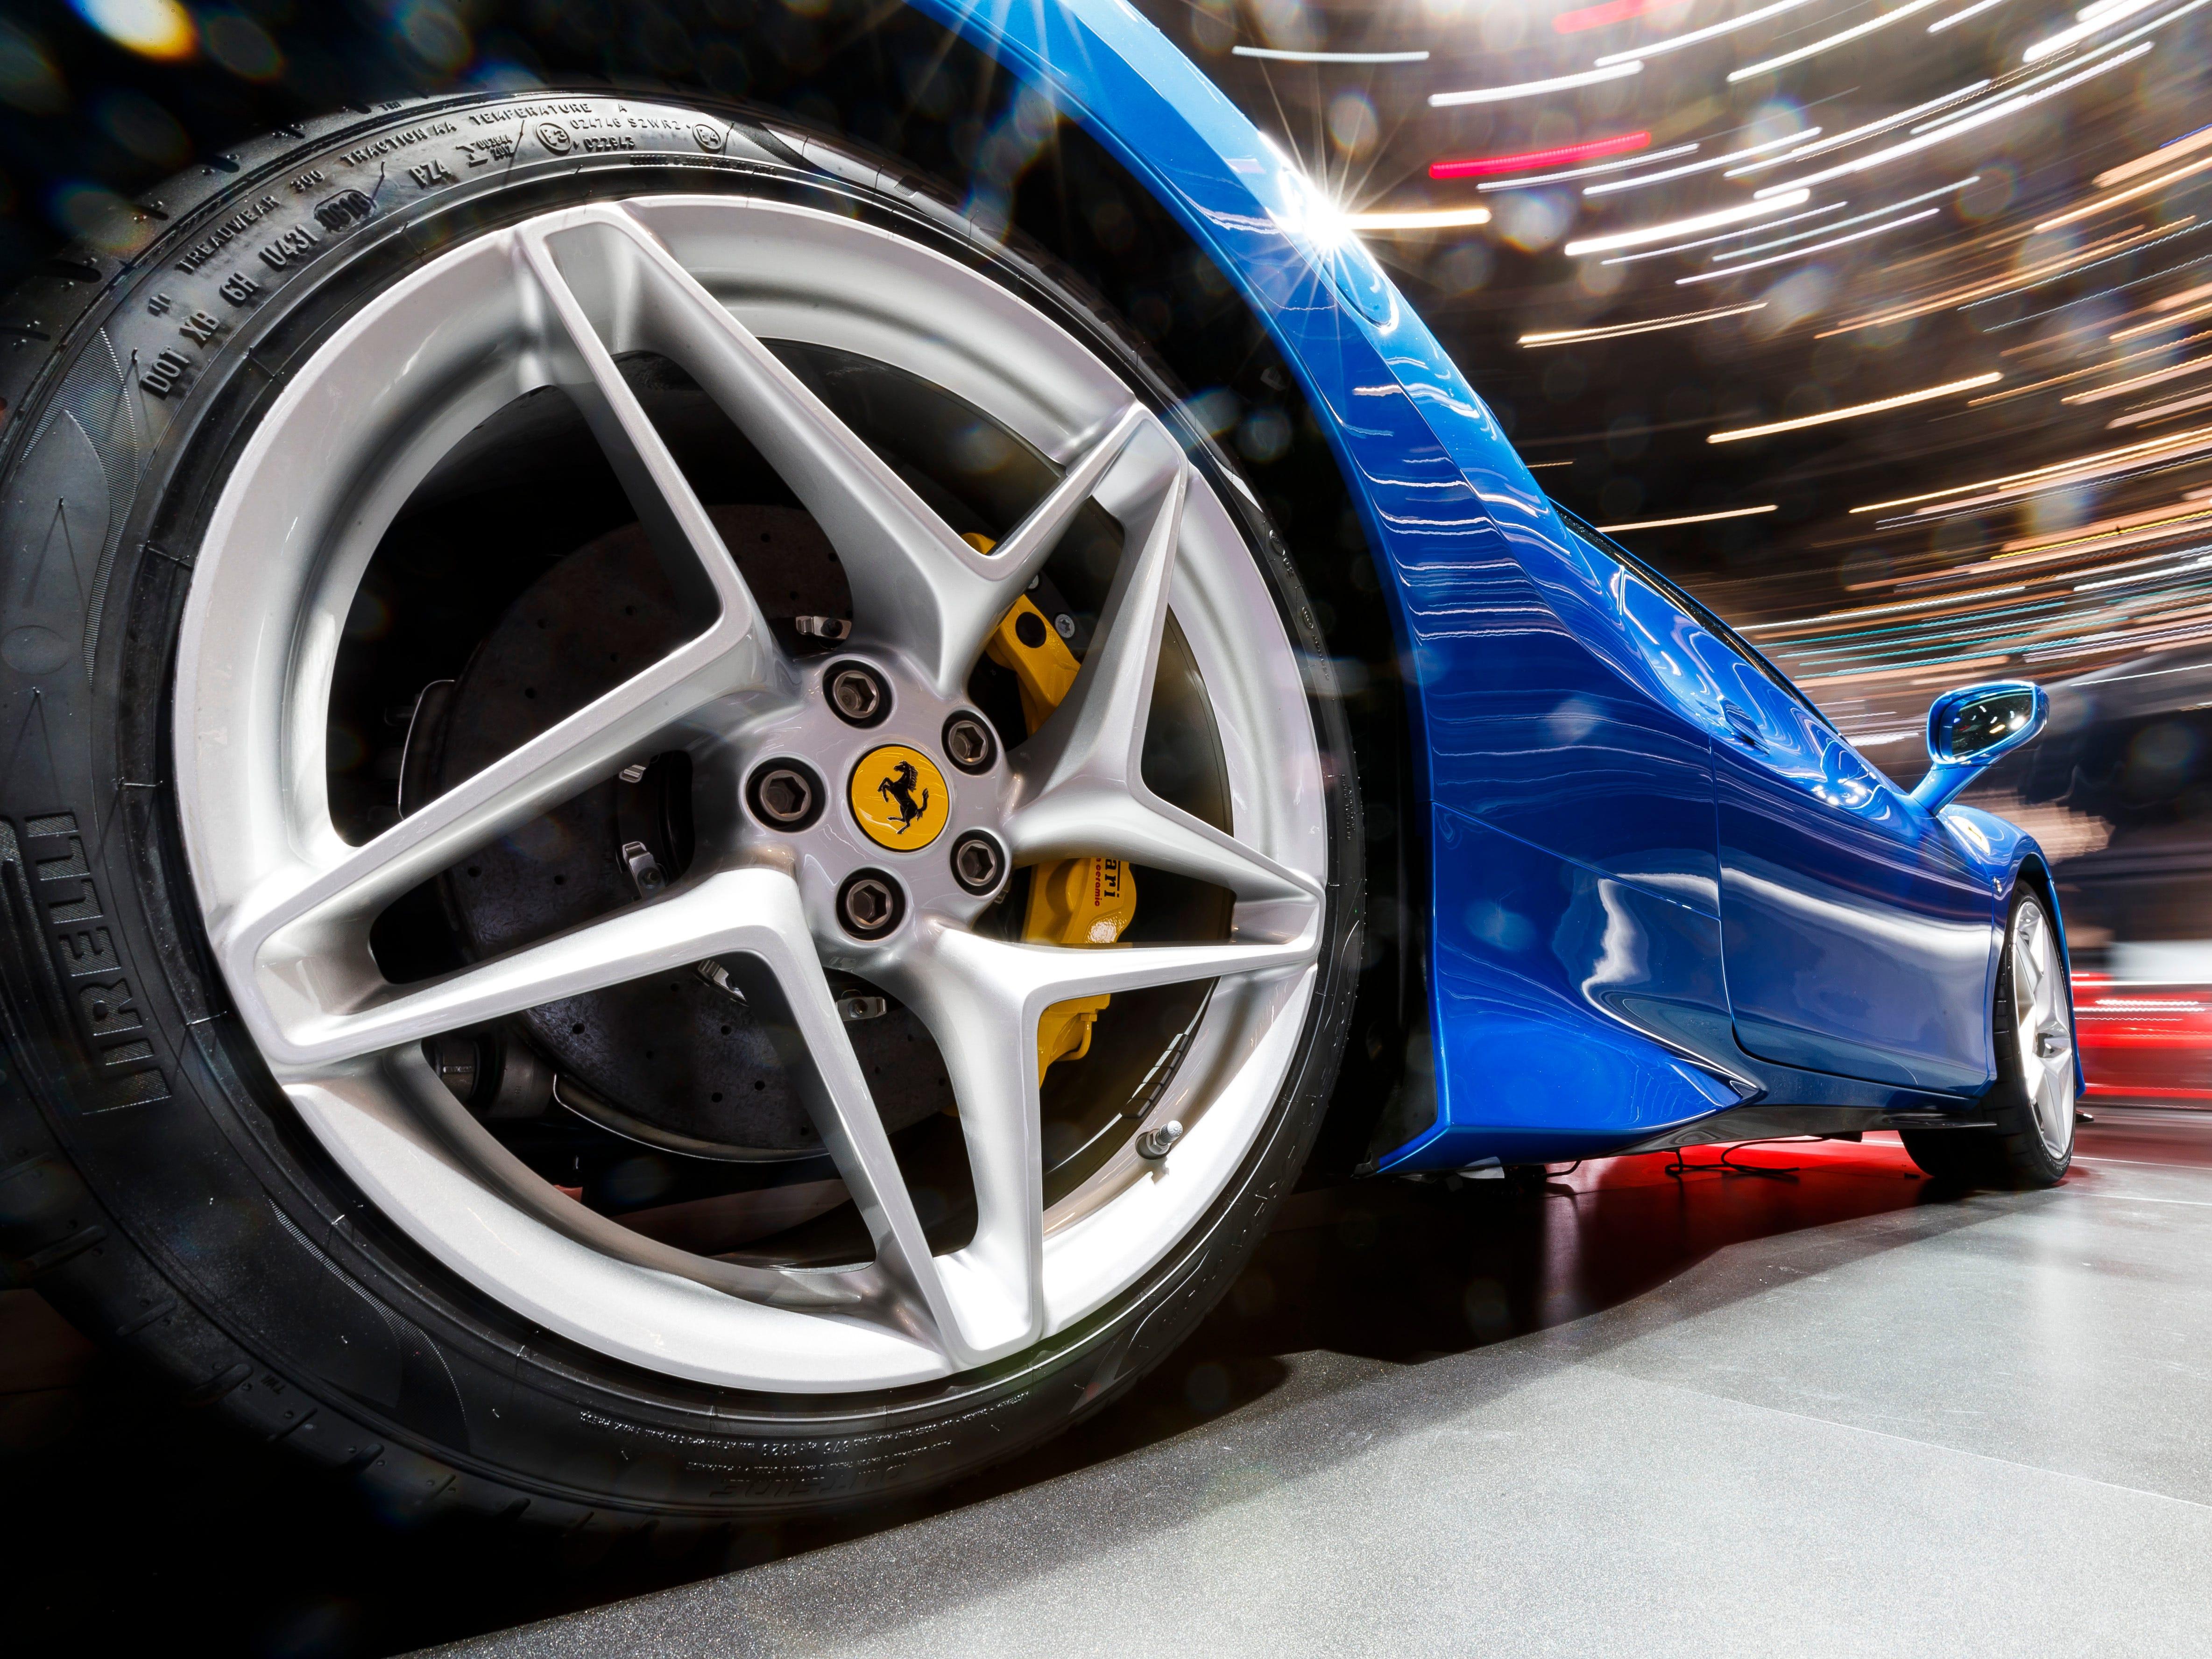 A closeup of the rear wheel on the Ferrari F8 Triturbo